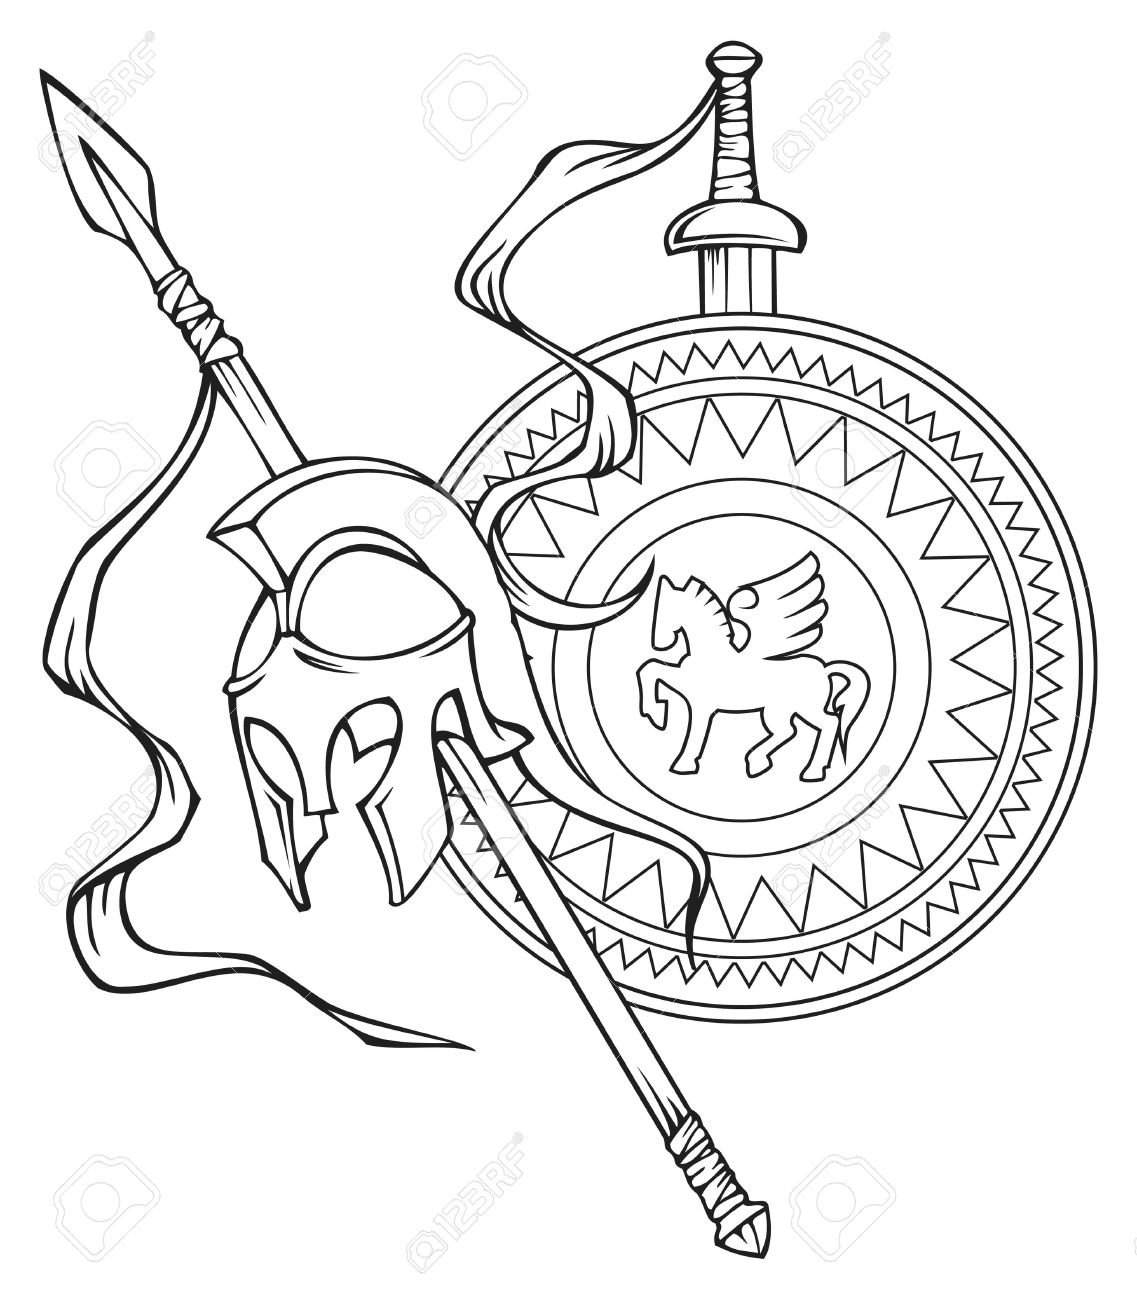 1137x1300 Imagem Relacionada Mitologia Grega Tattoo